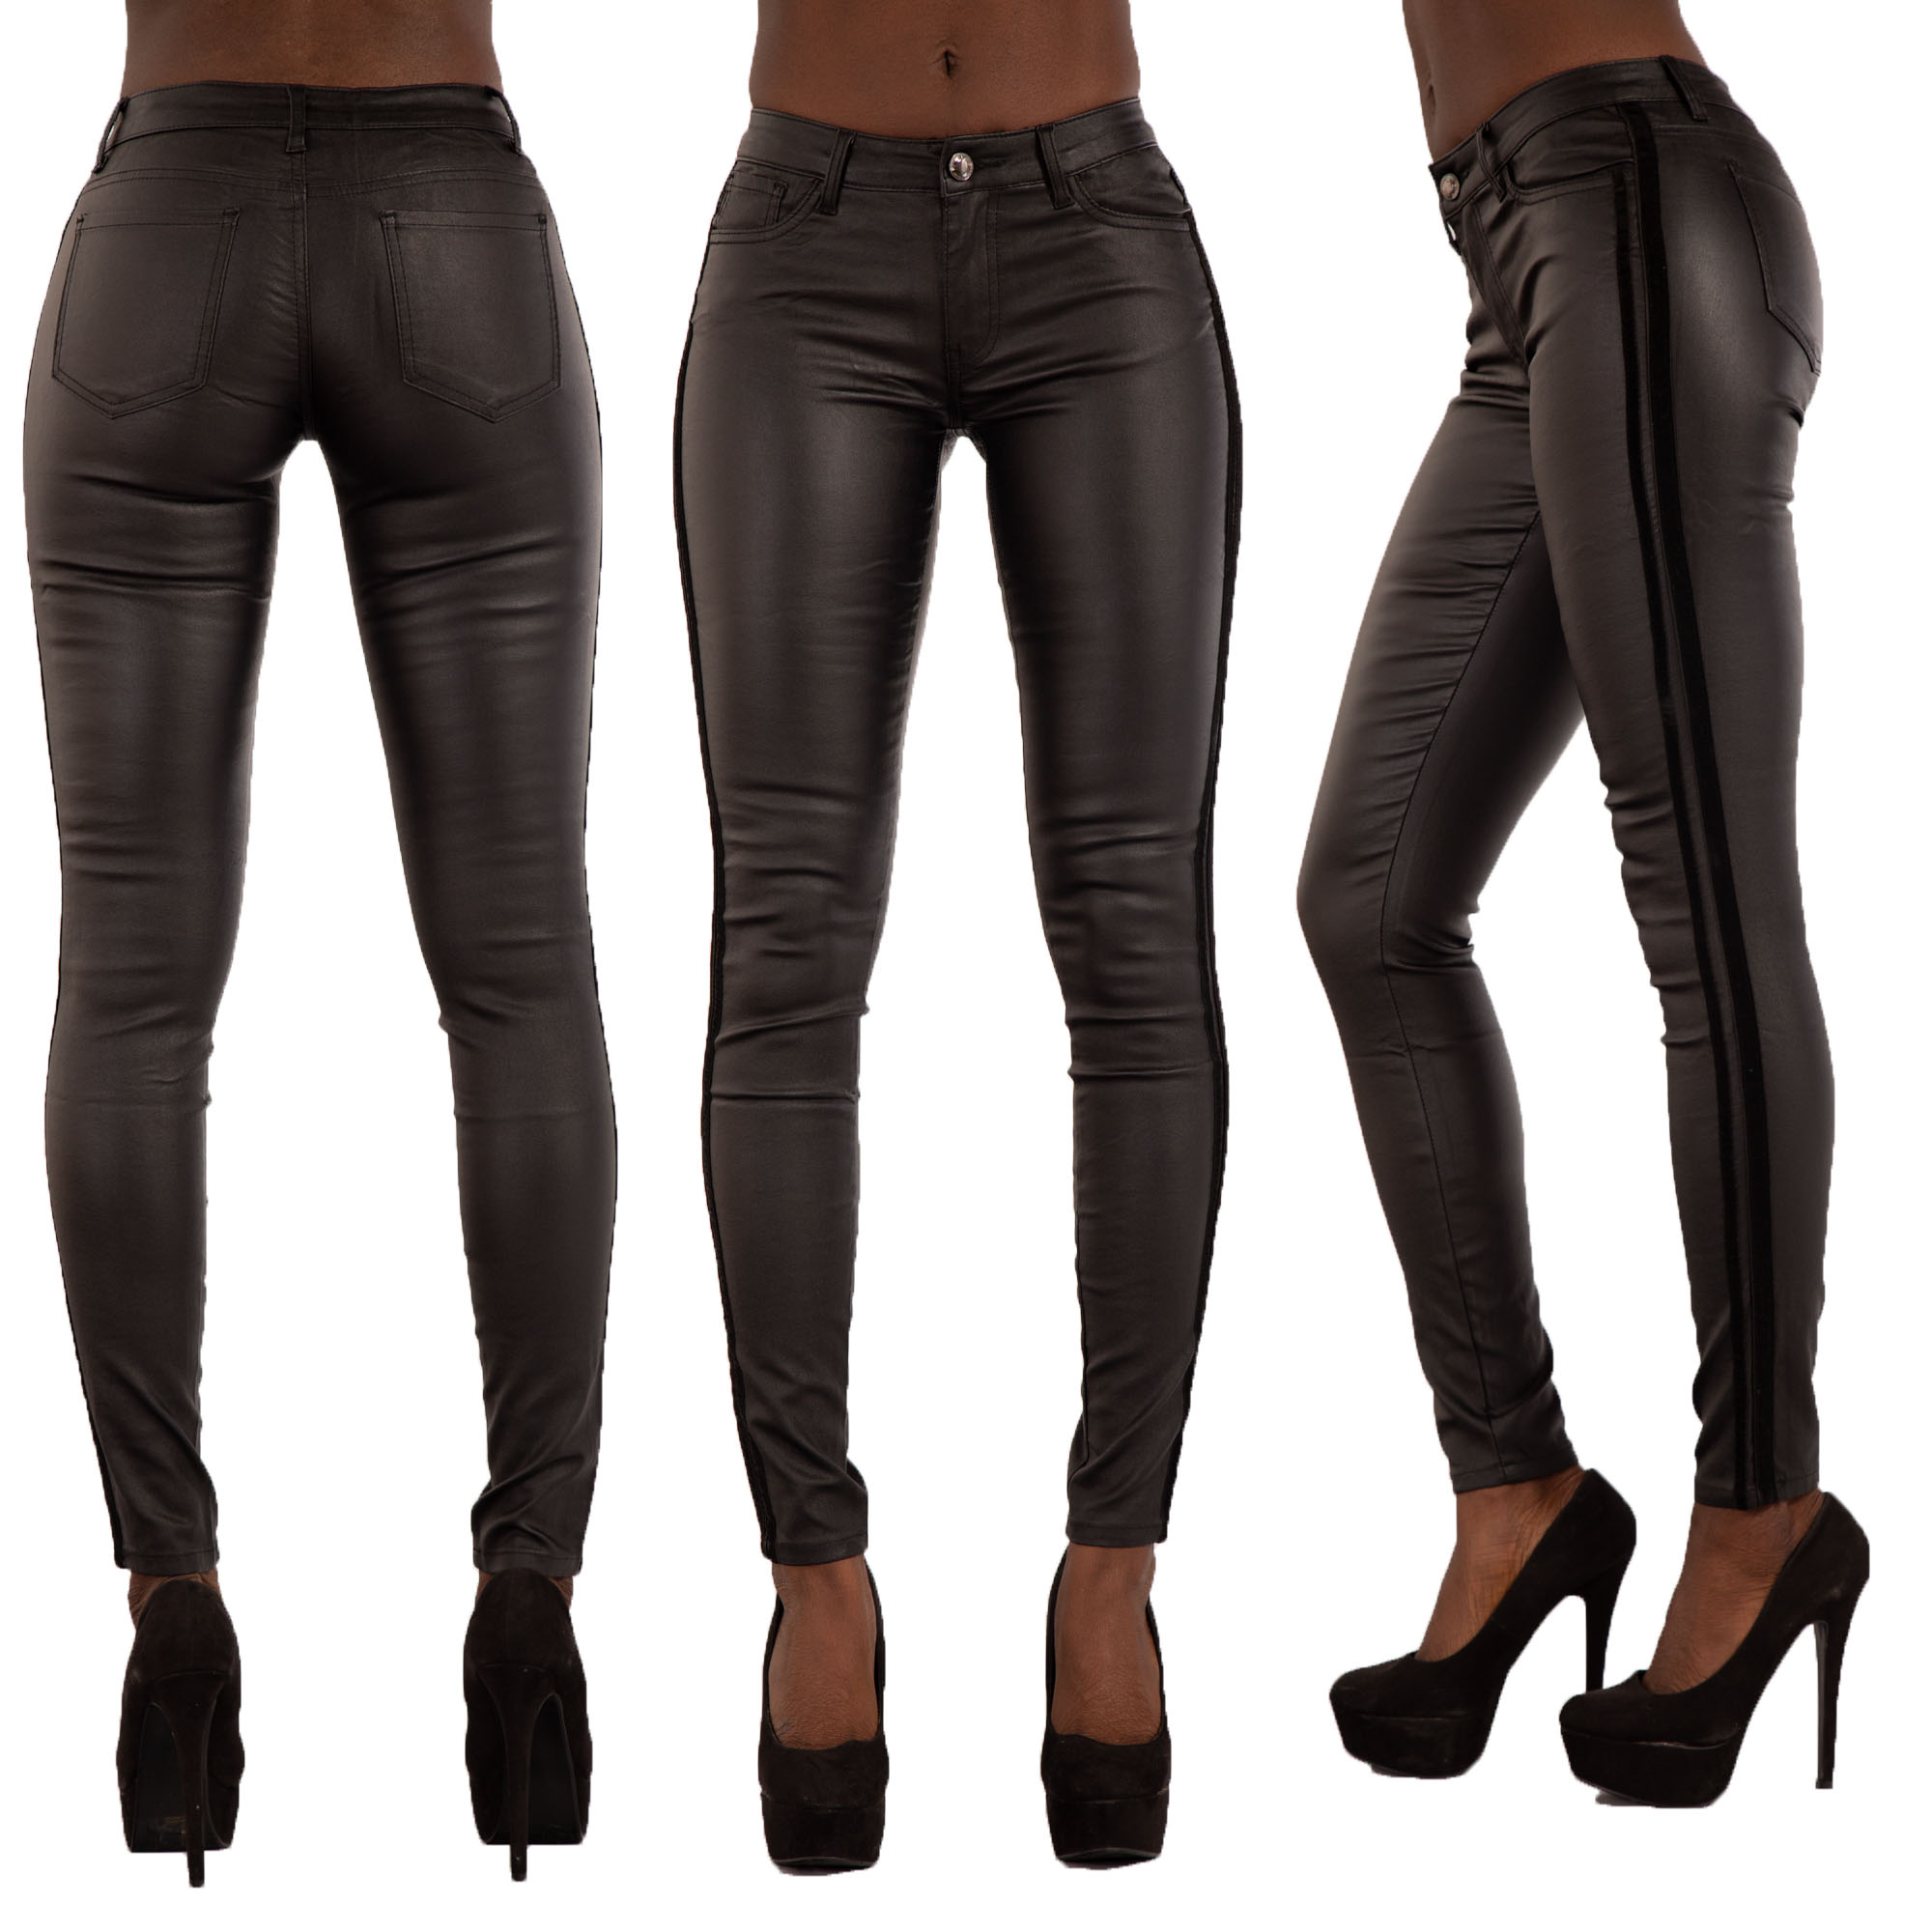 "Roman Originals Women/'s Stretchy Skinny 32/"" Bengaline Trousers"